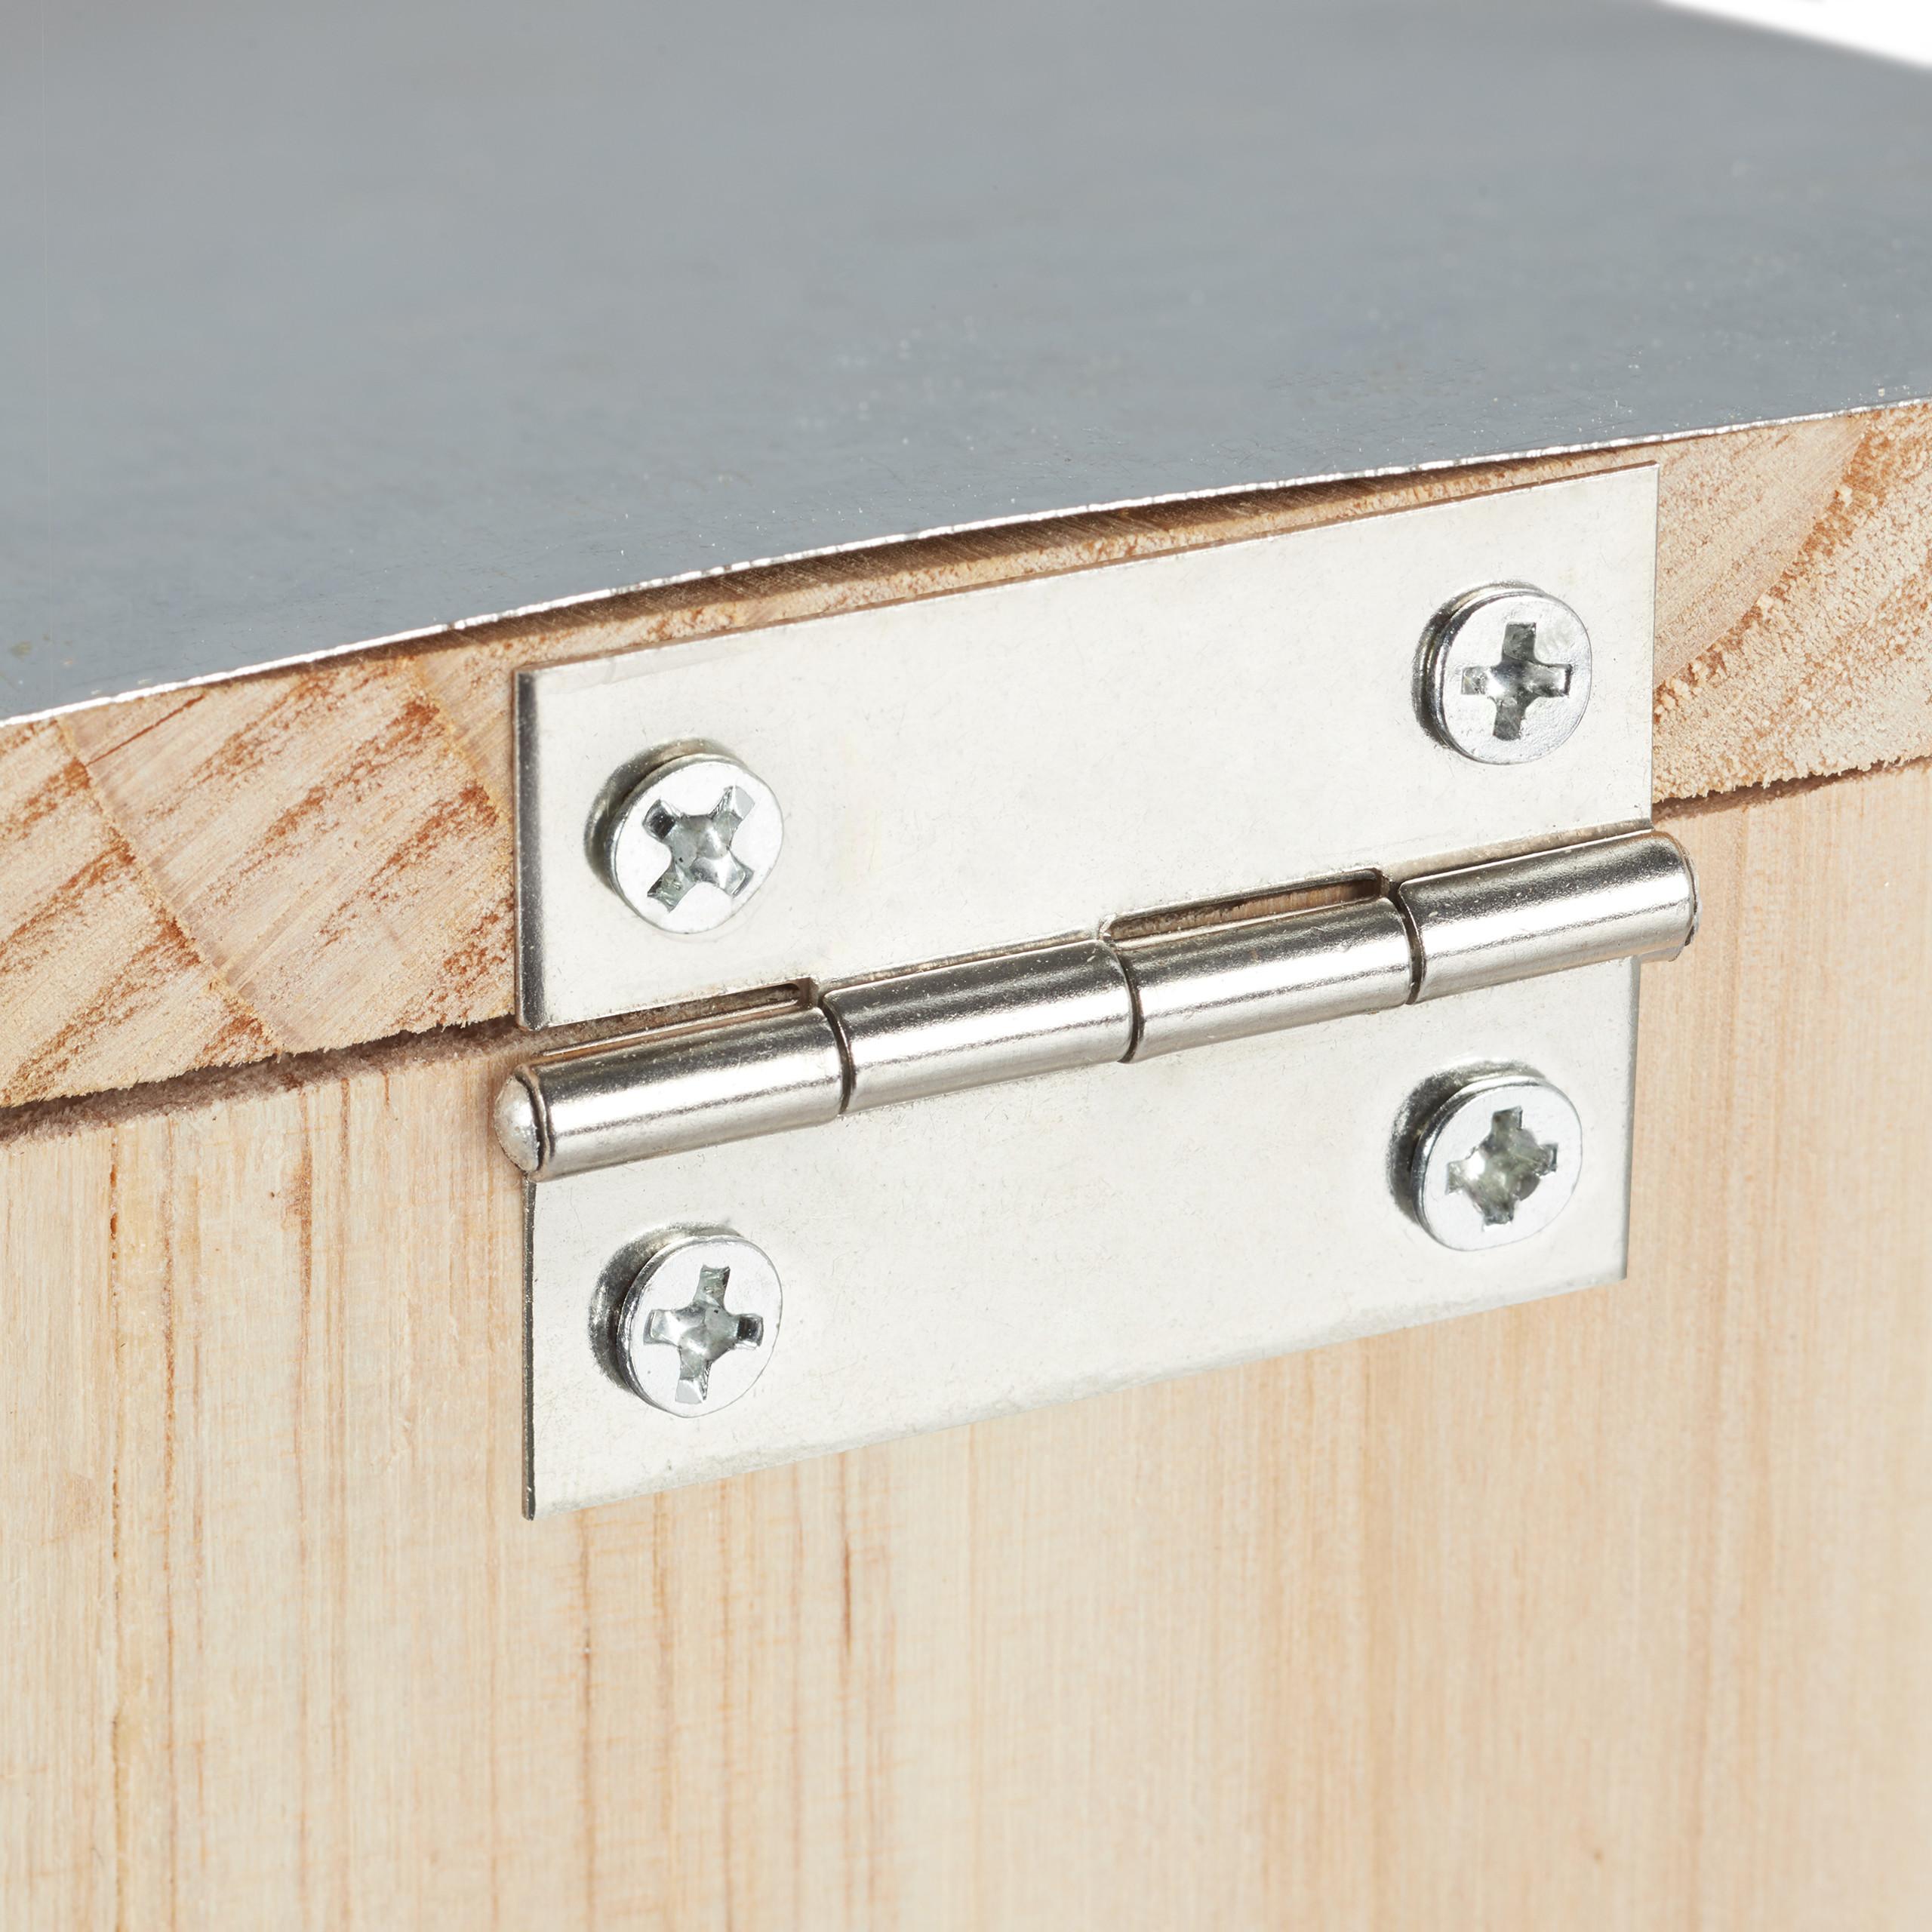 eekhoorn-voederhuisje-metalen-dak-hout-voederhuis-voederkast miniatuur 8